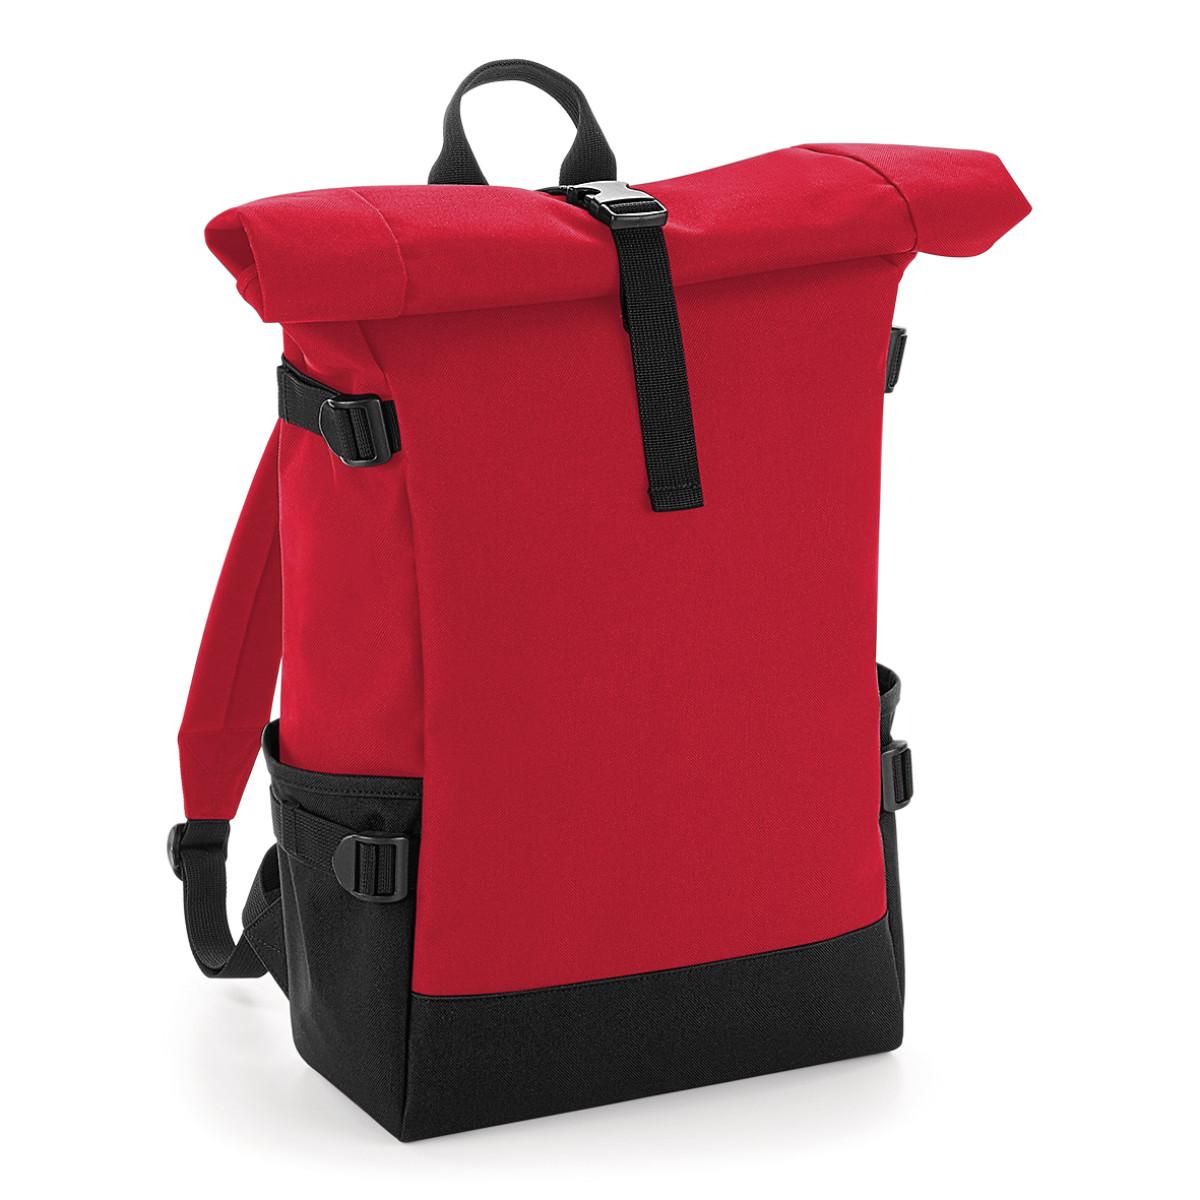 Bagbase Block Roll-Top Backpack